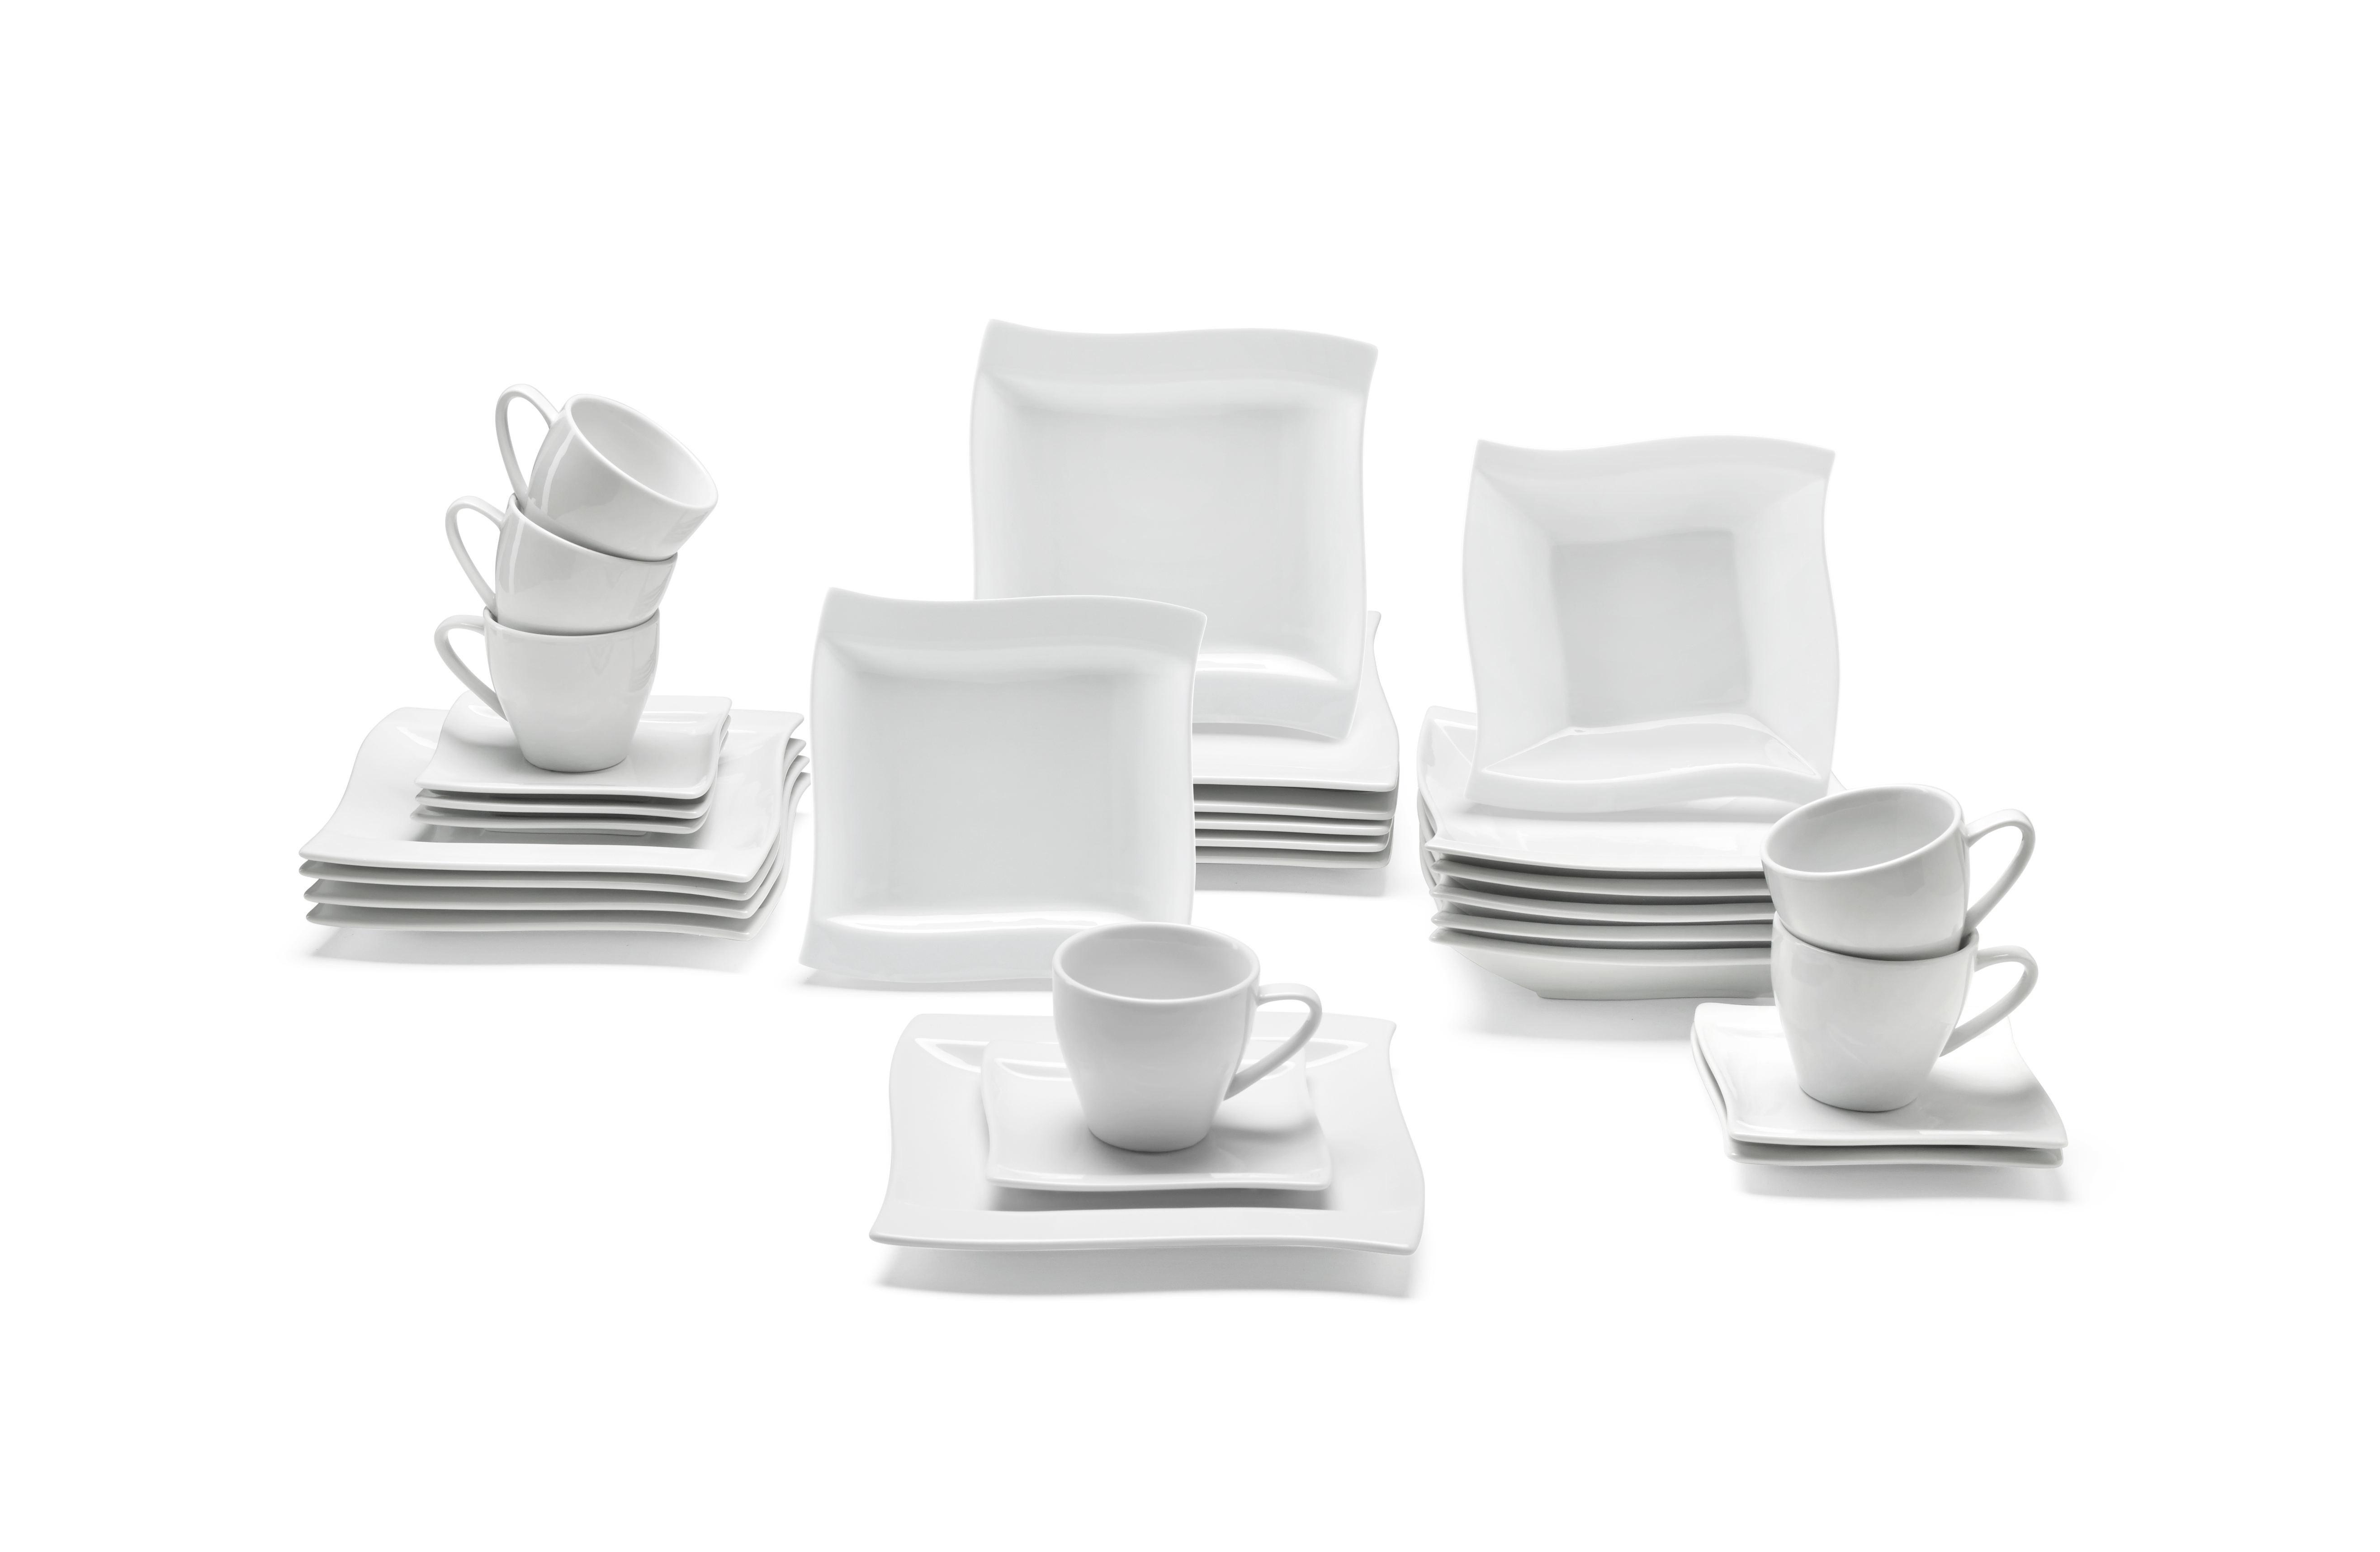 Kombiservice Katja 30-teilig in Weiß - Weiß, Keramik - PREMIUM LIVING